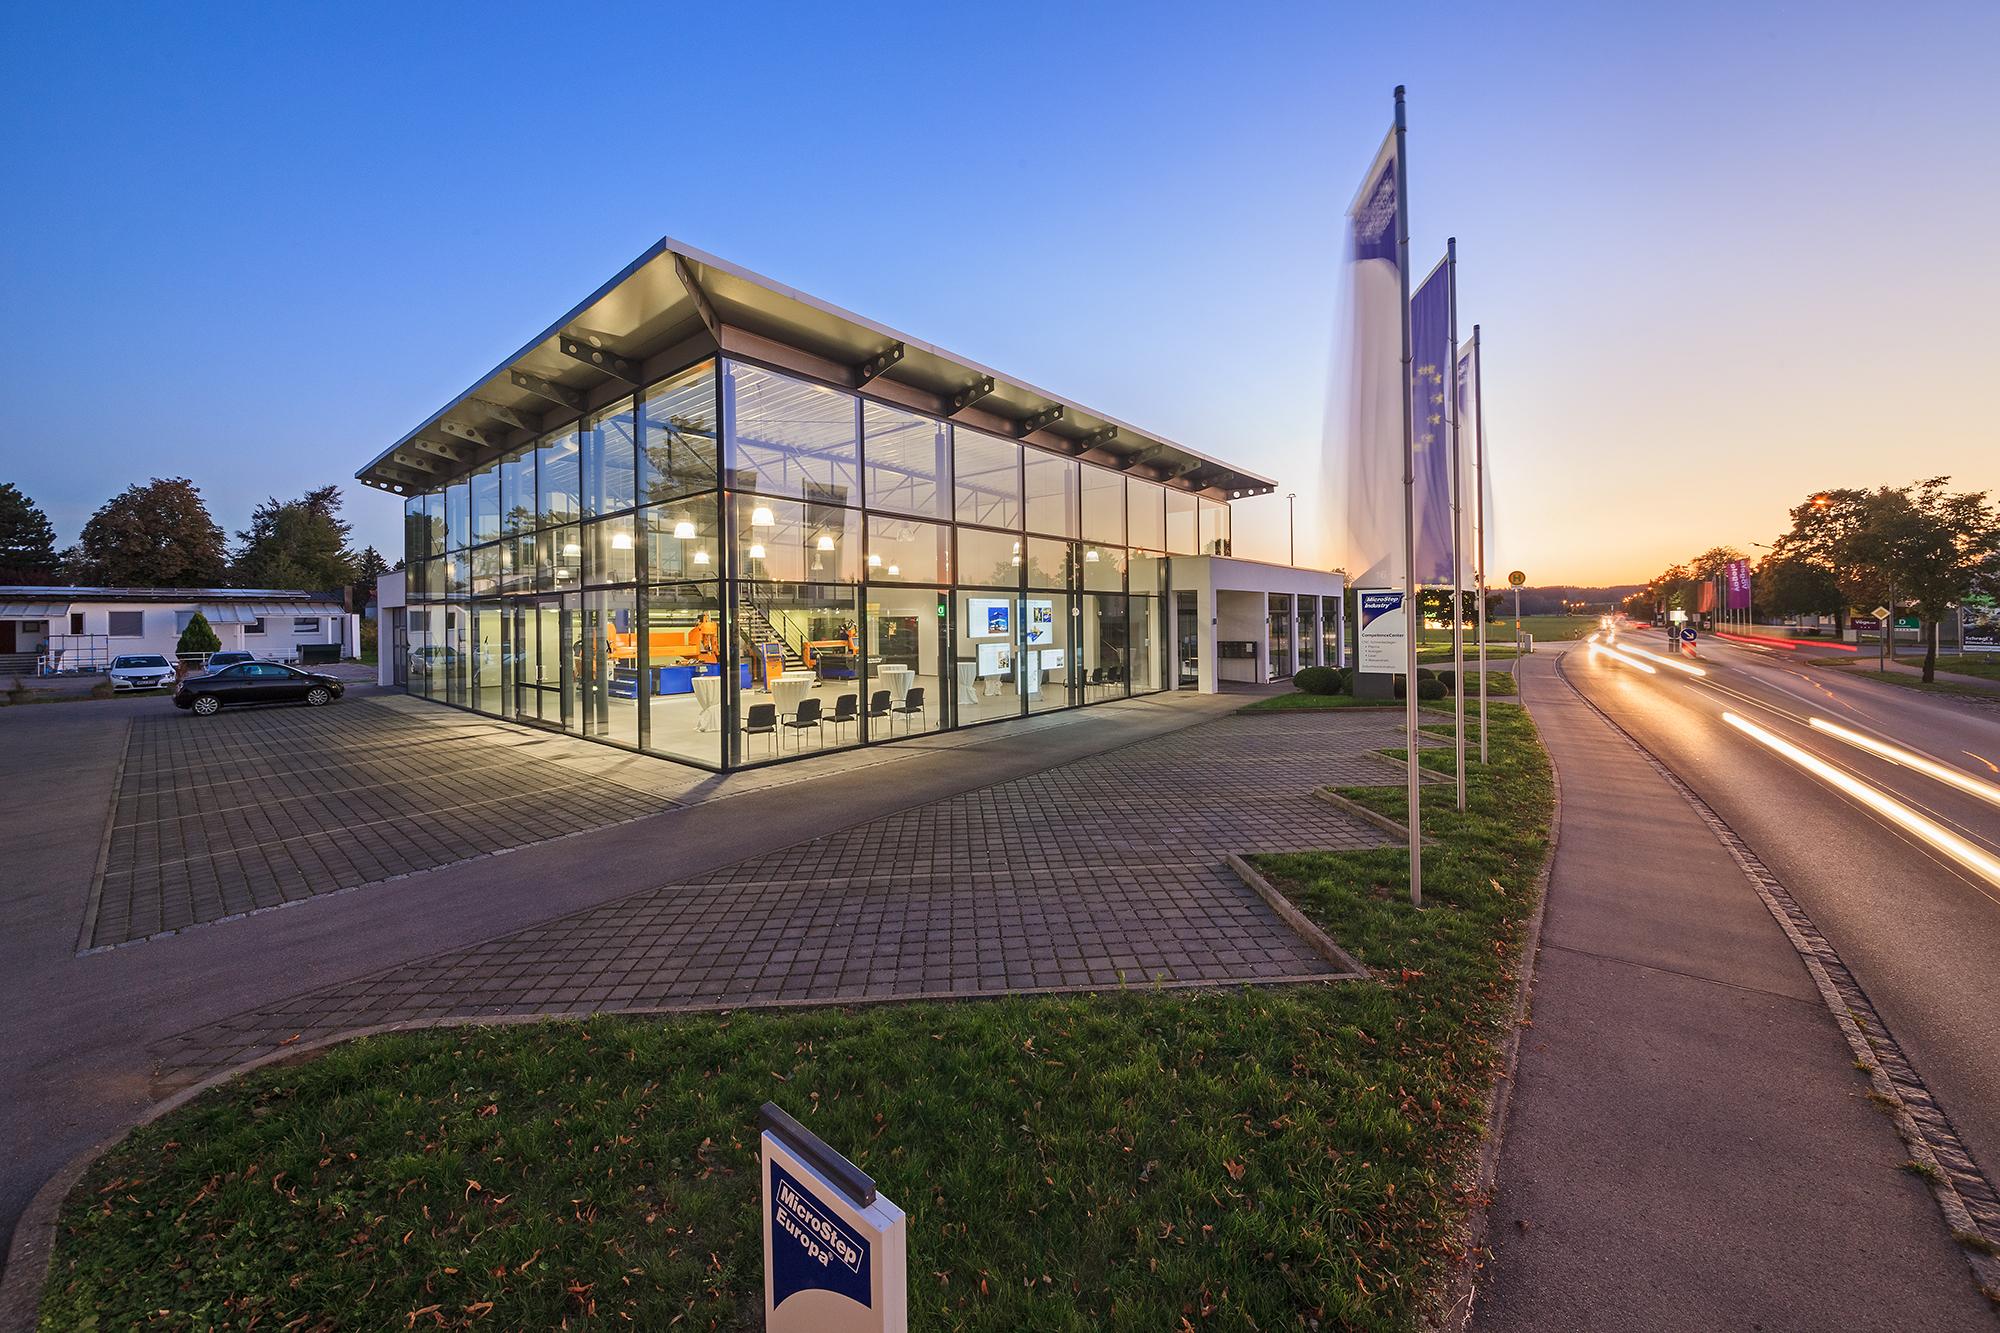 Novootvoren� showroom MicroStep CompetenceCenter� v centr�le MicroStep Europa GmbH v Bad W�rishofen, Nemecko.